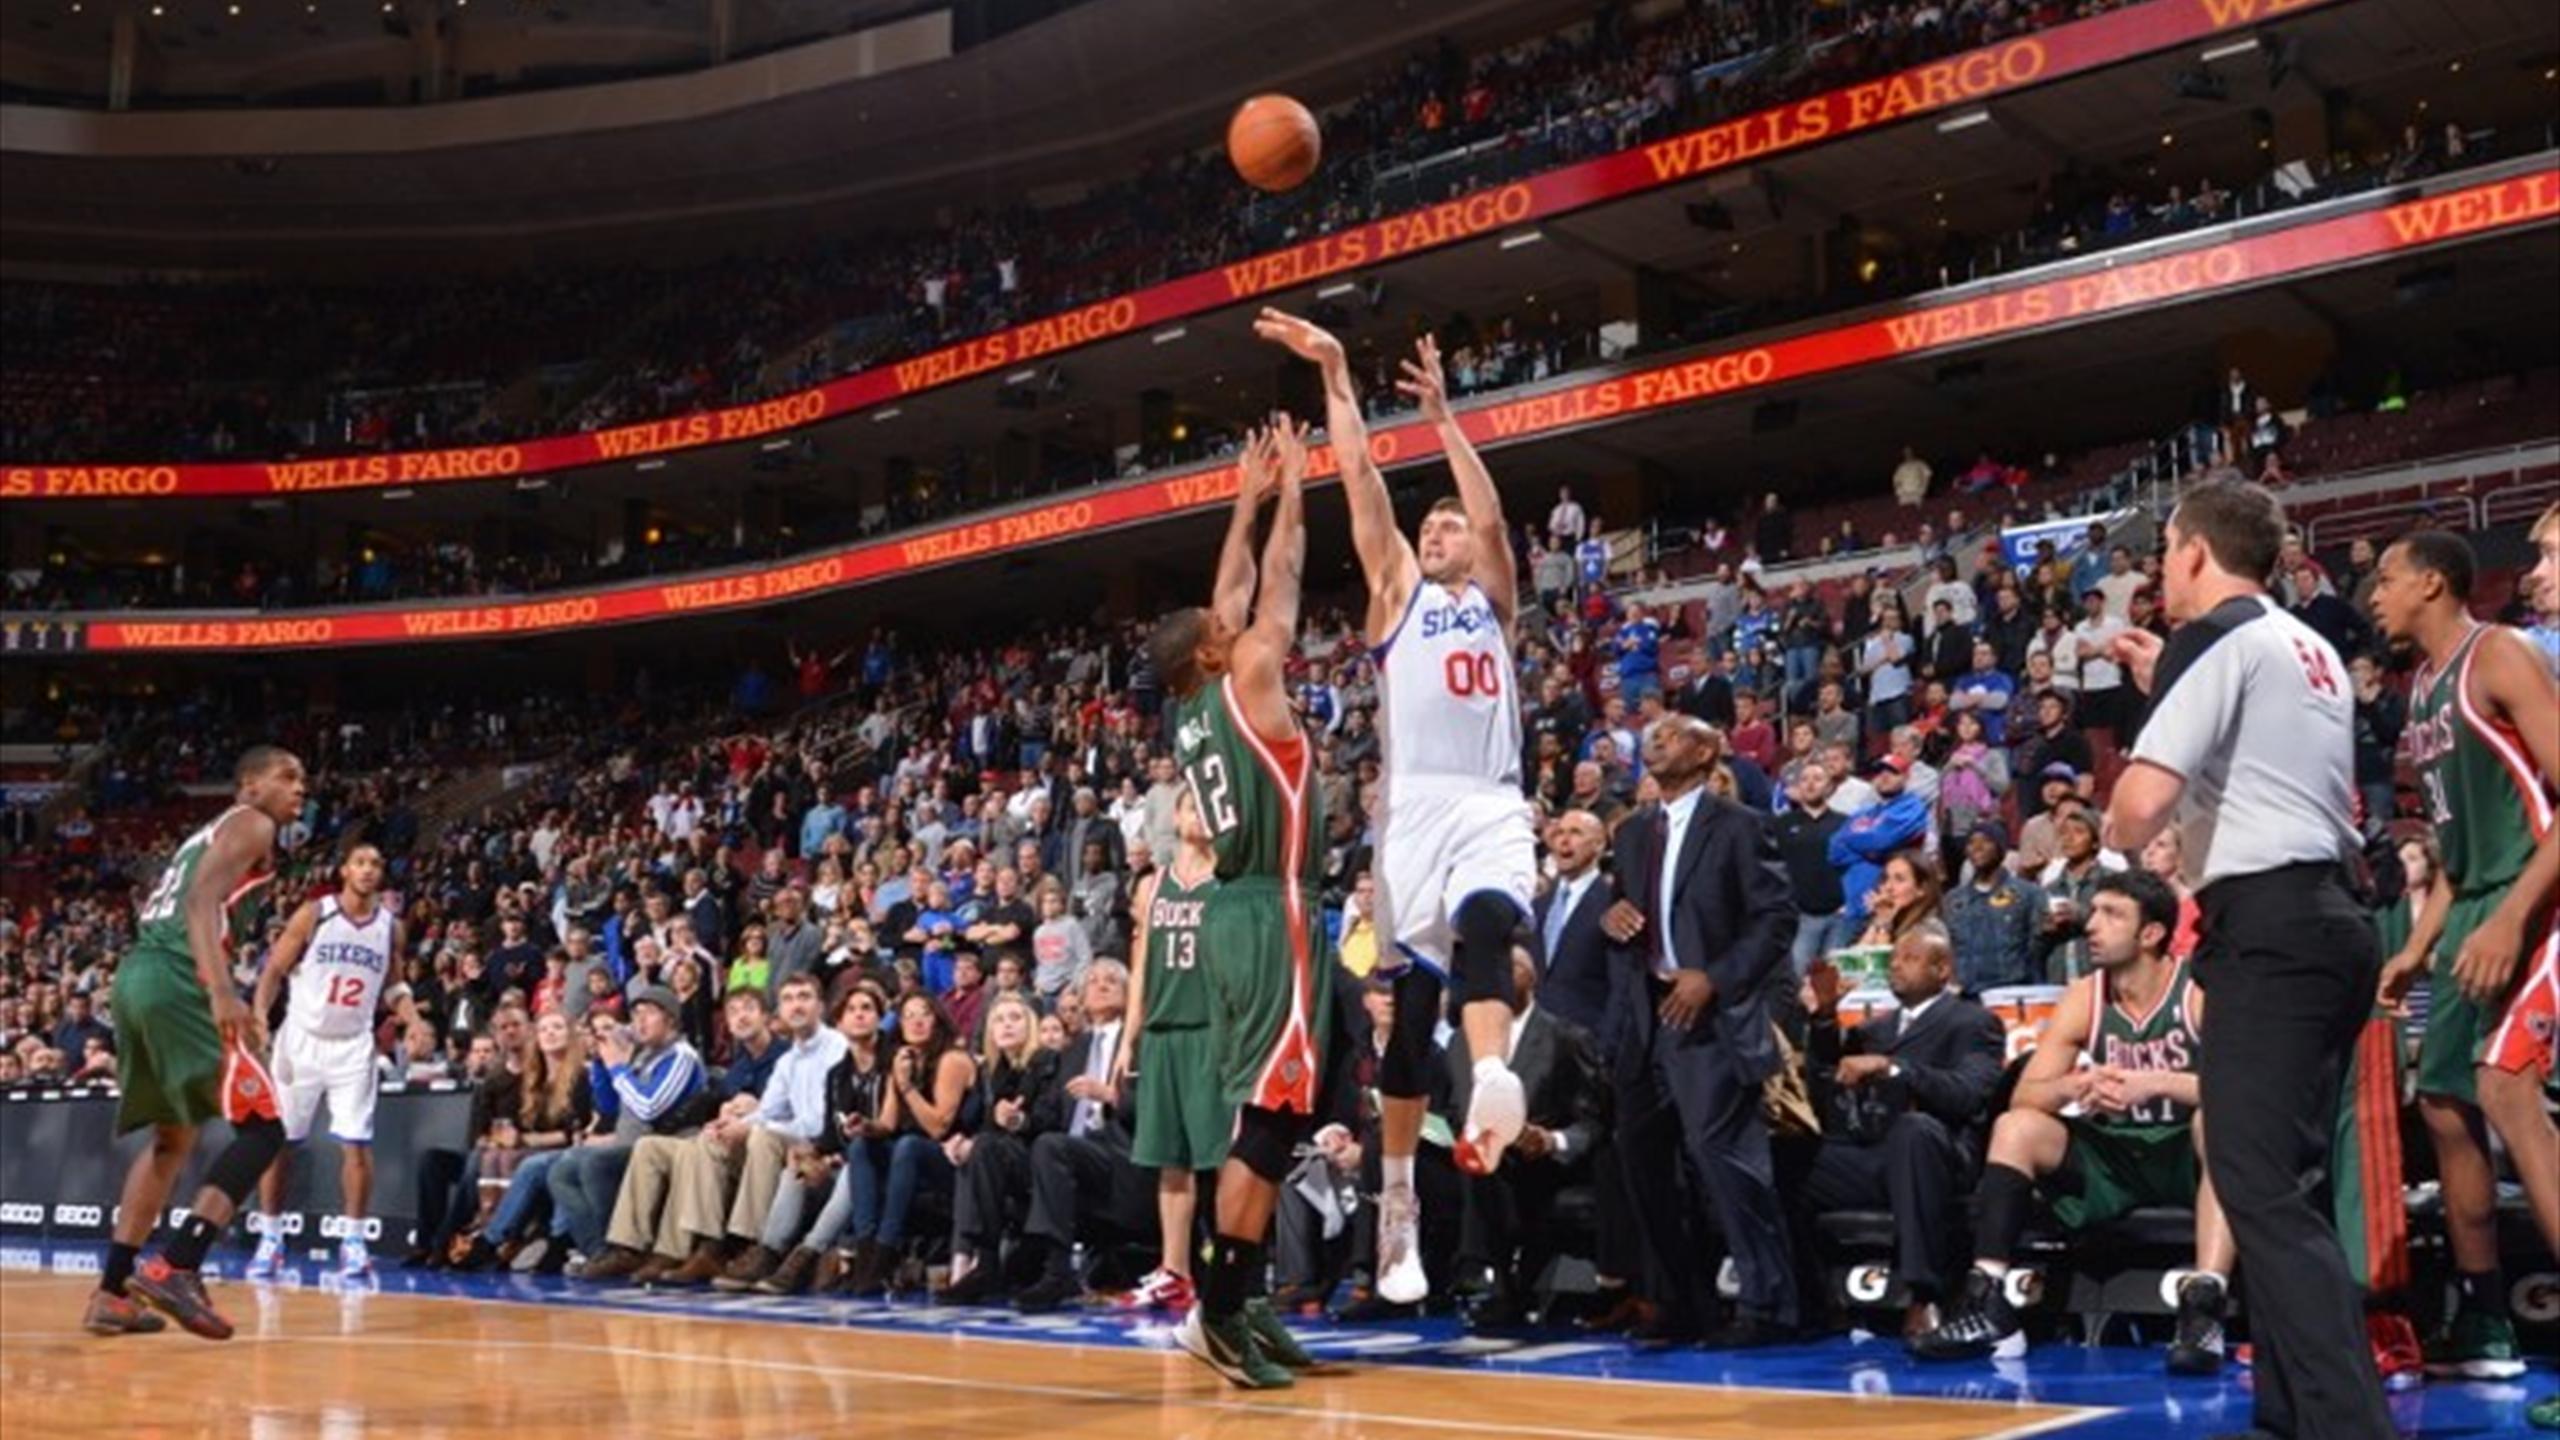 NBAde geceye damga vuran en güzel hareketler